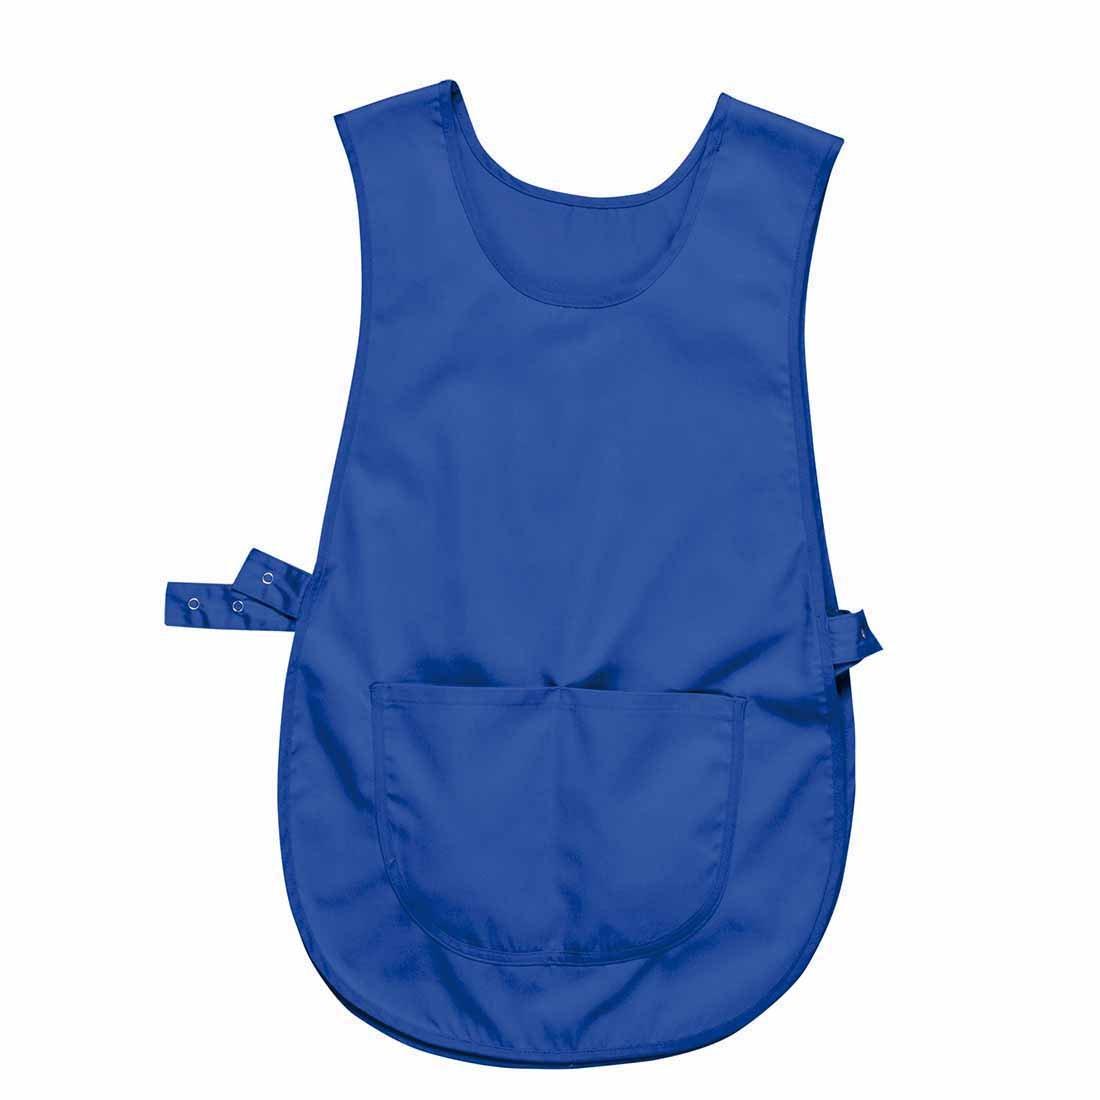 Portwest Tabard with Pockets Medium Royal Blue Ref S843RYLBLMED 374613